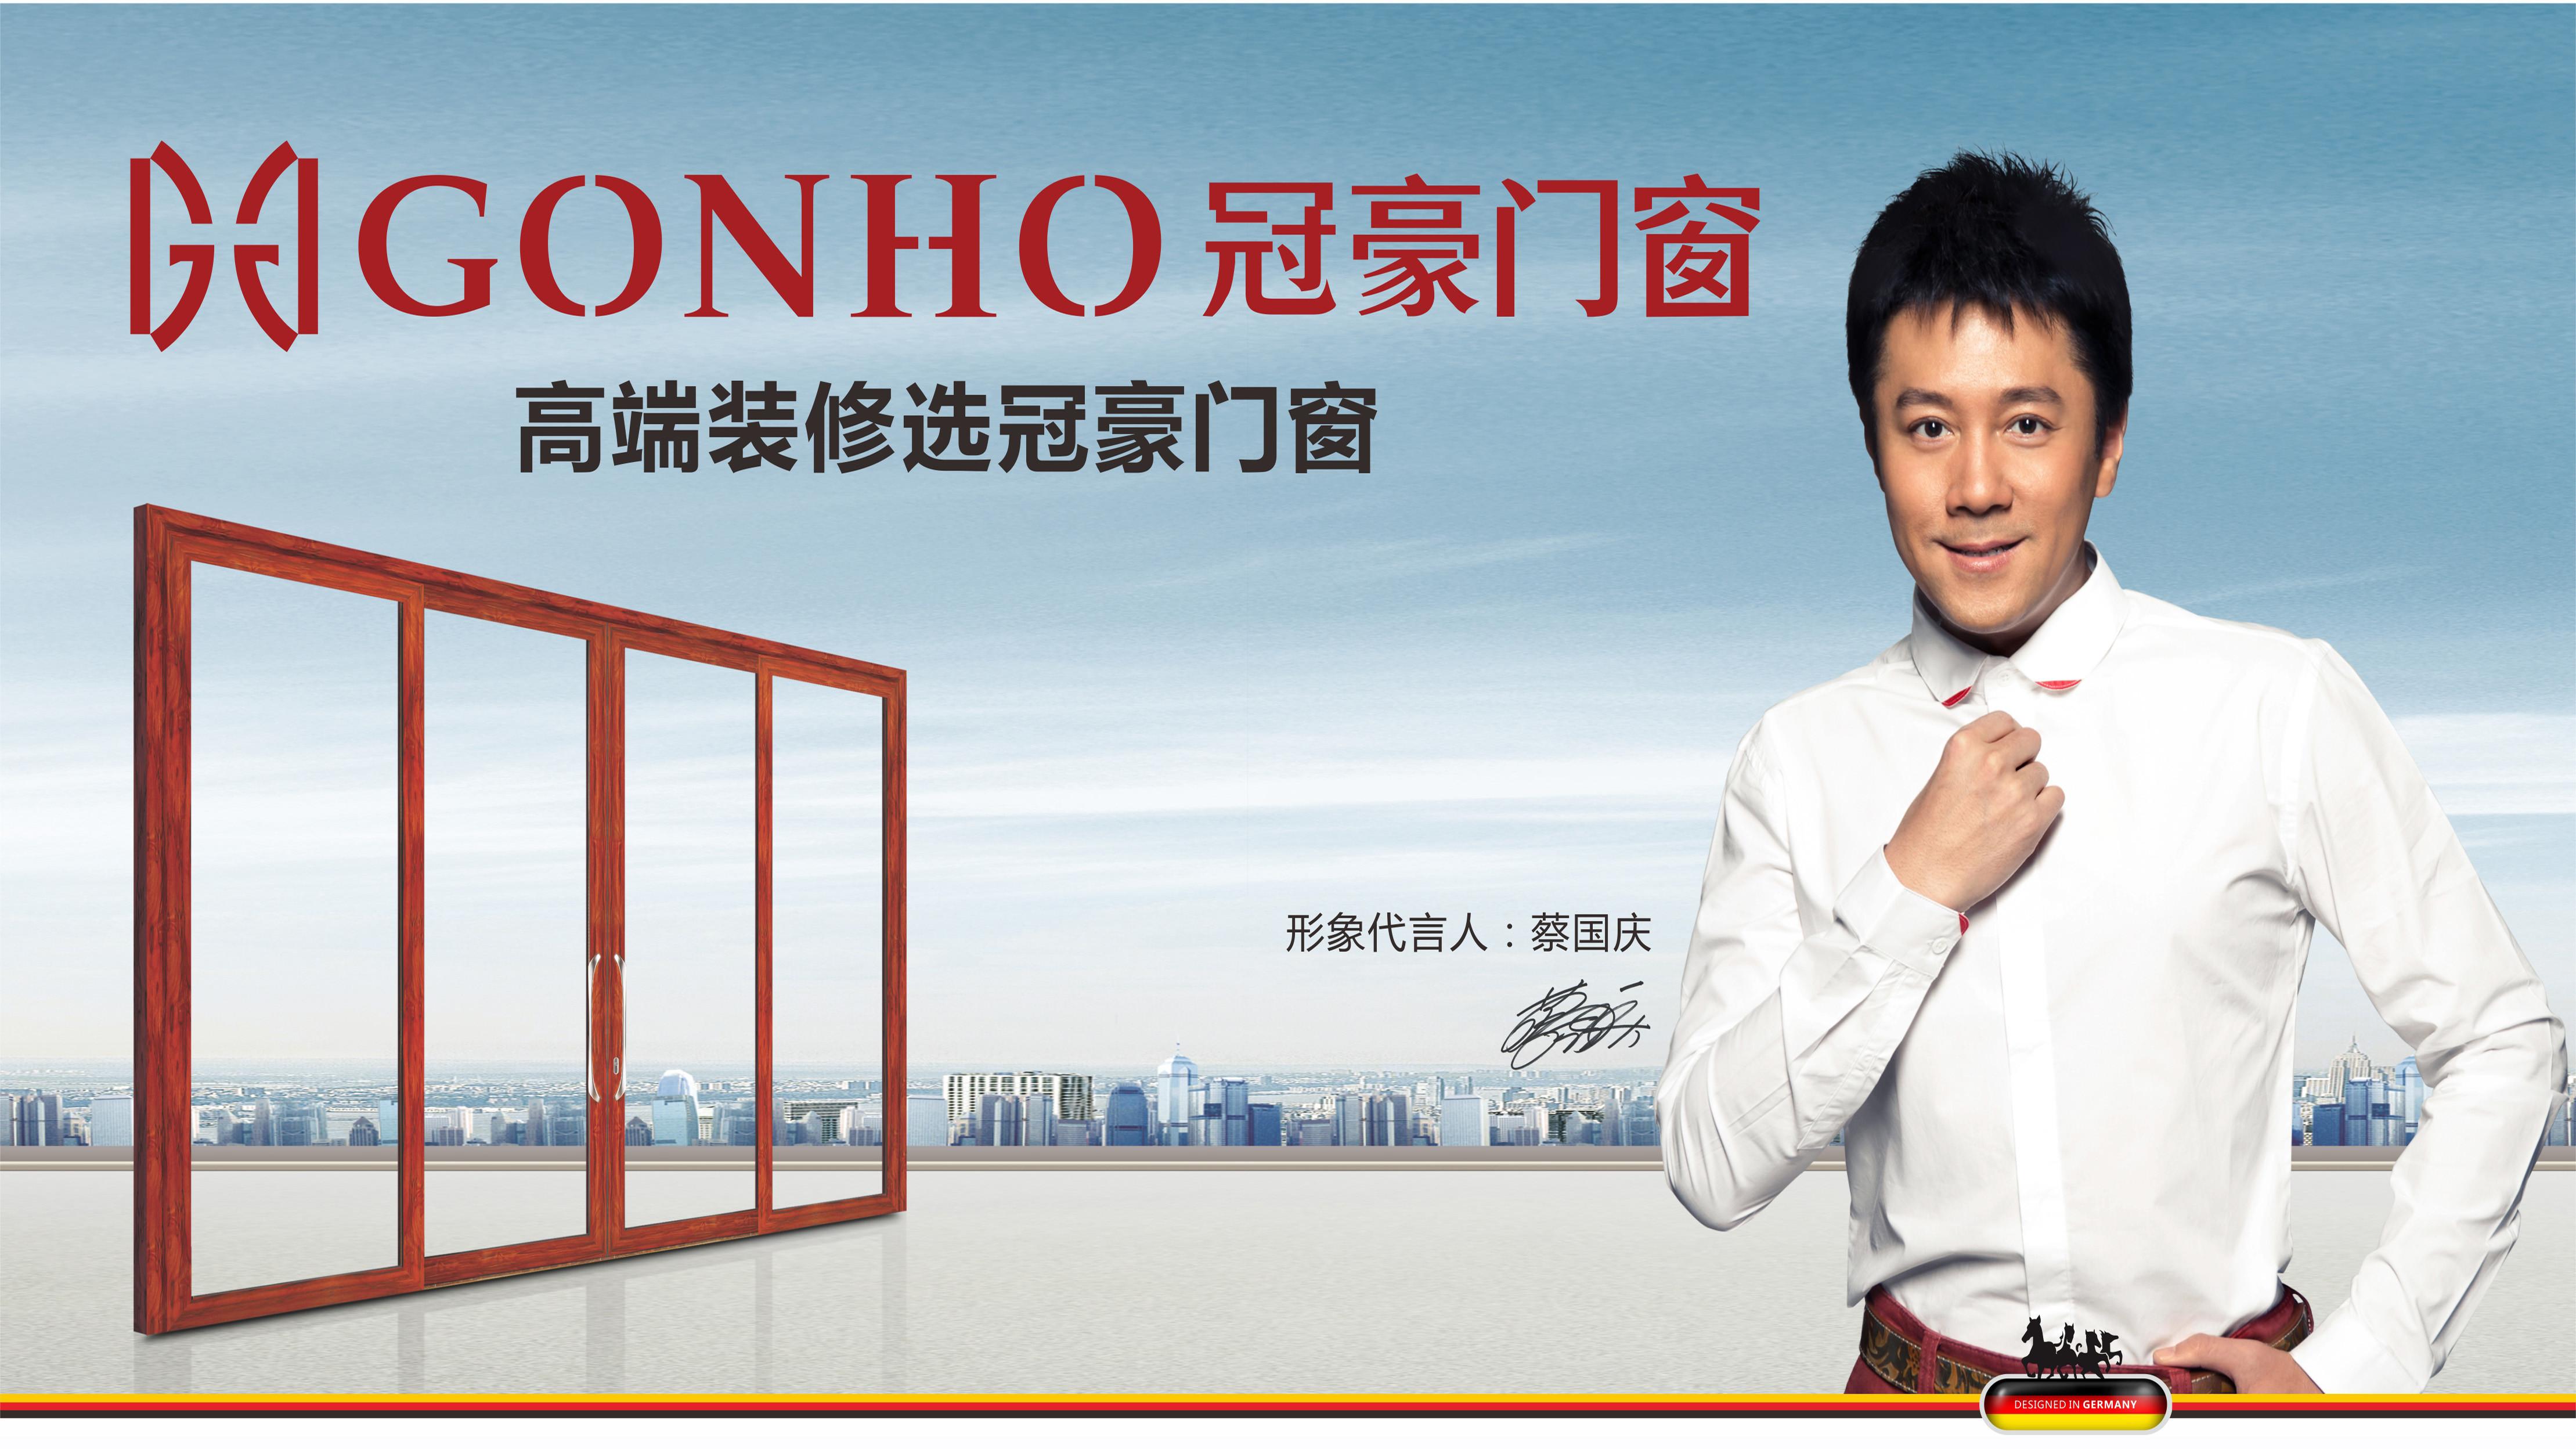 GONHO(红星美凯龙园区商场)